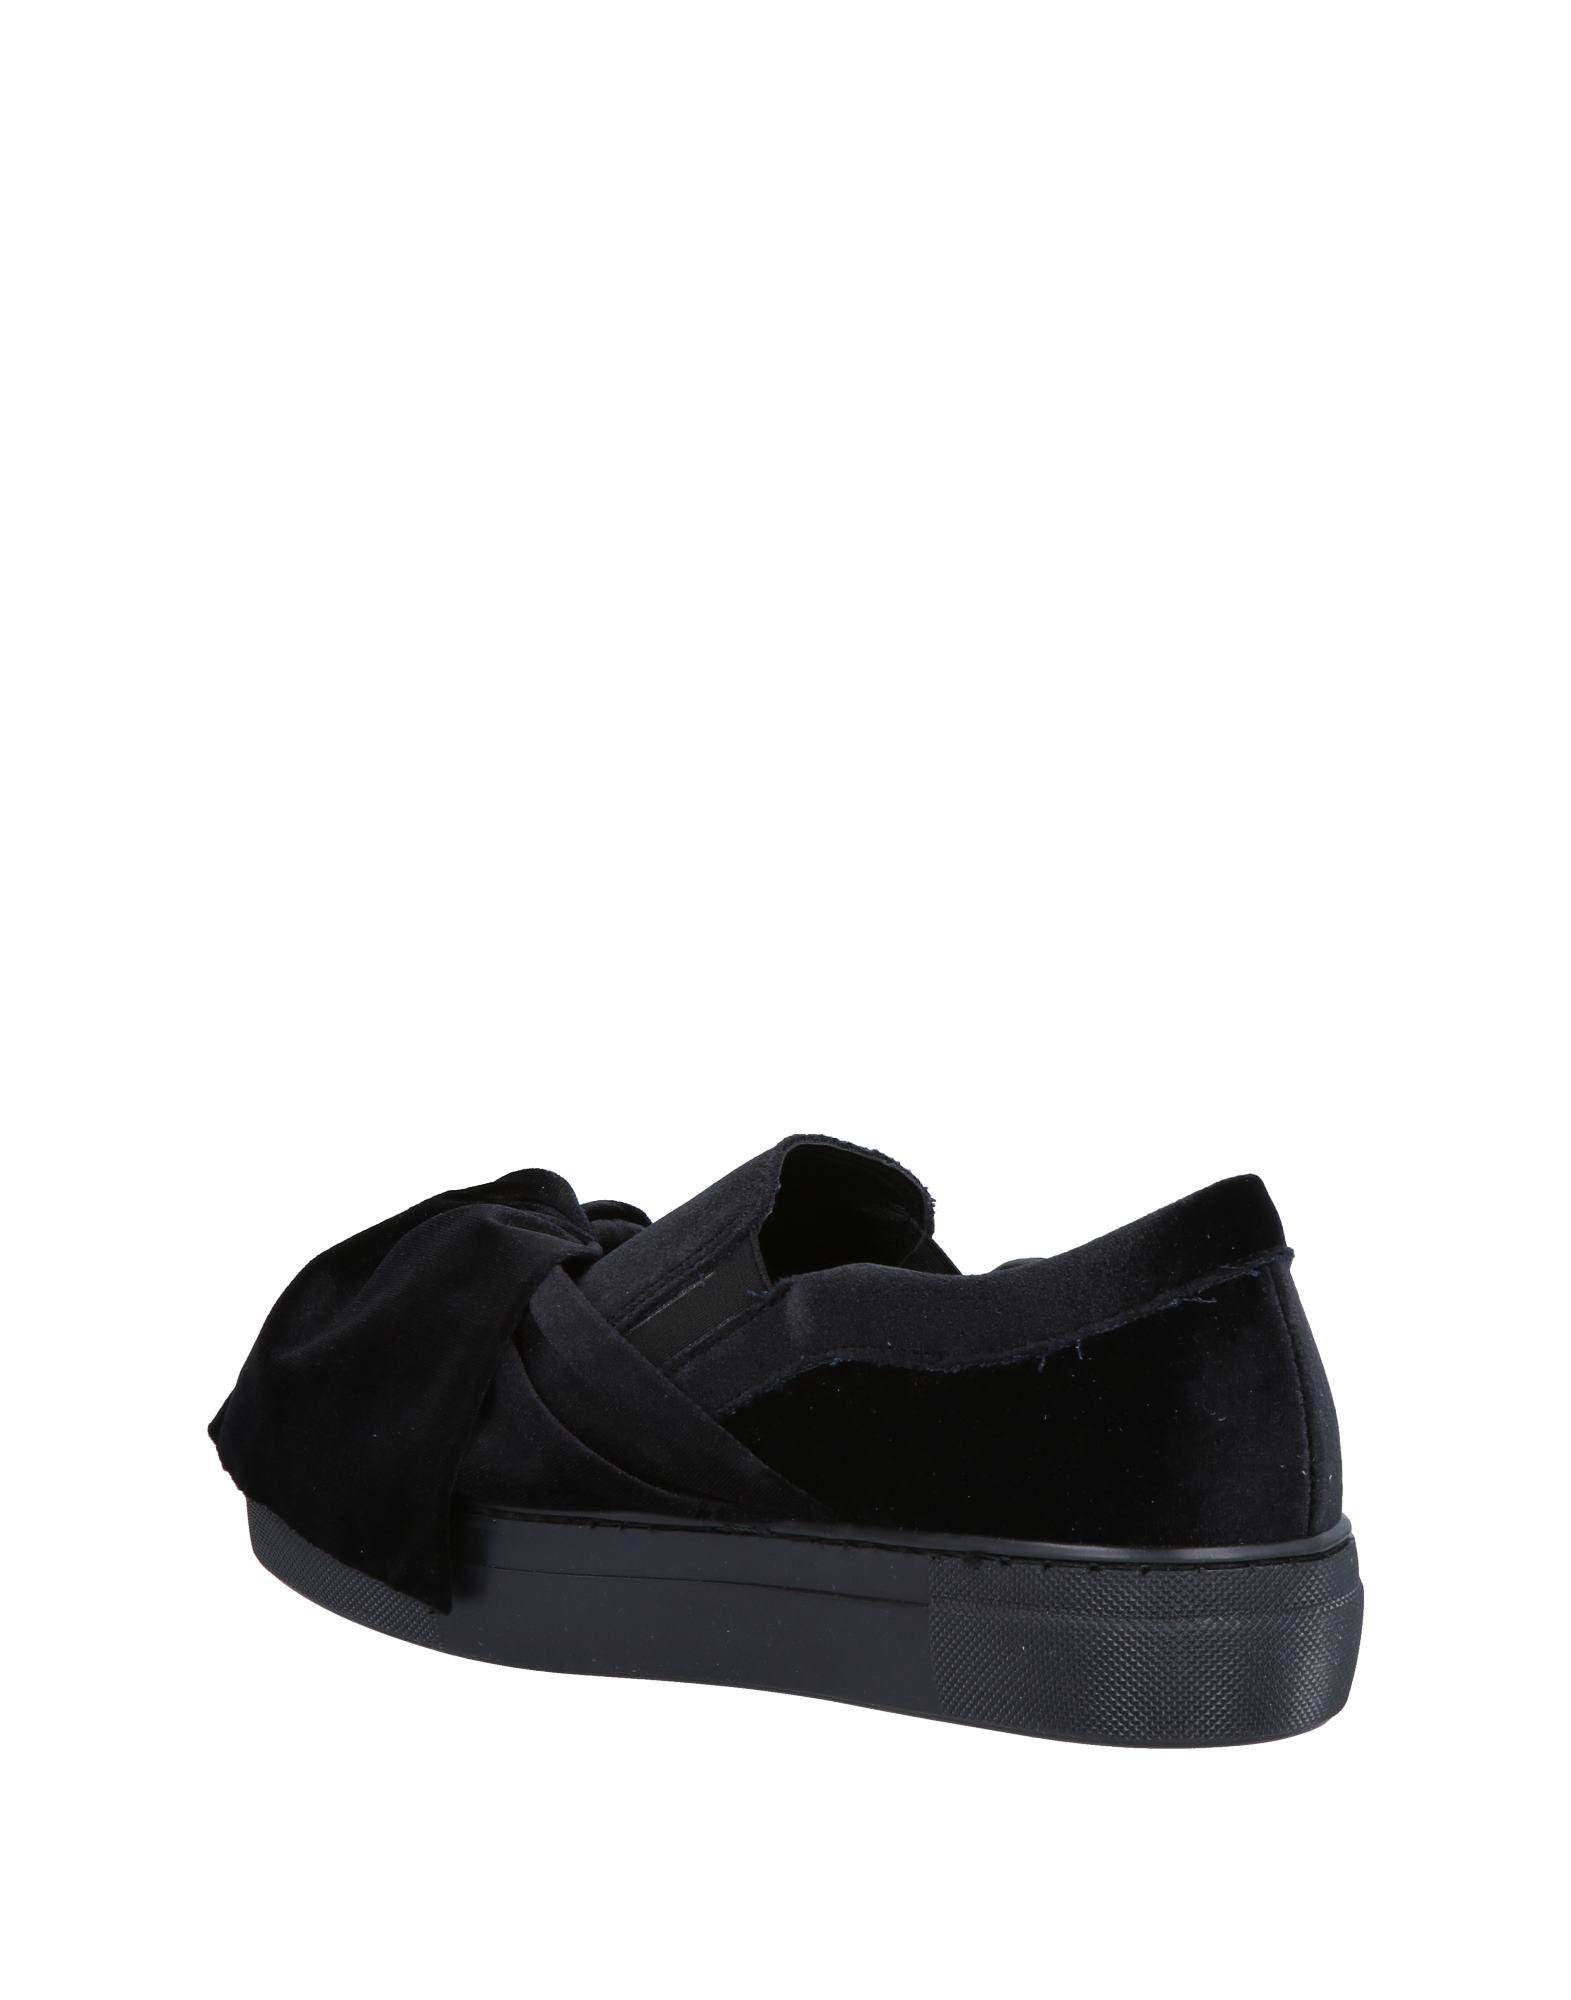 Nila & 11474021GI Nila Sneakers Damen  11474021GI & Gute Qualität beliebte Schuhe 55babe